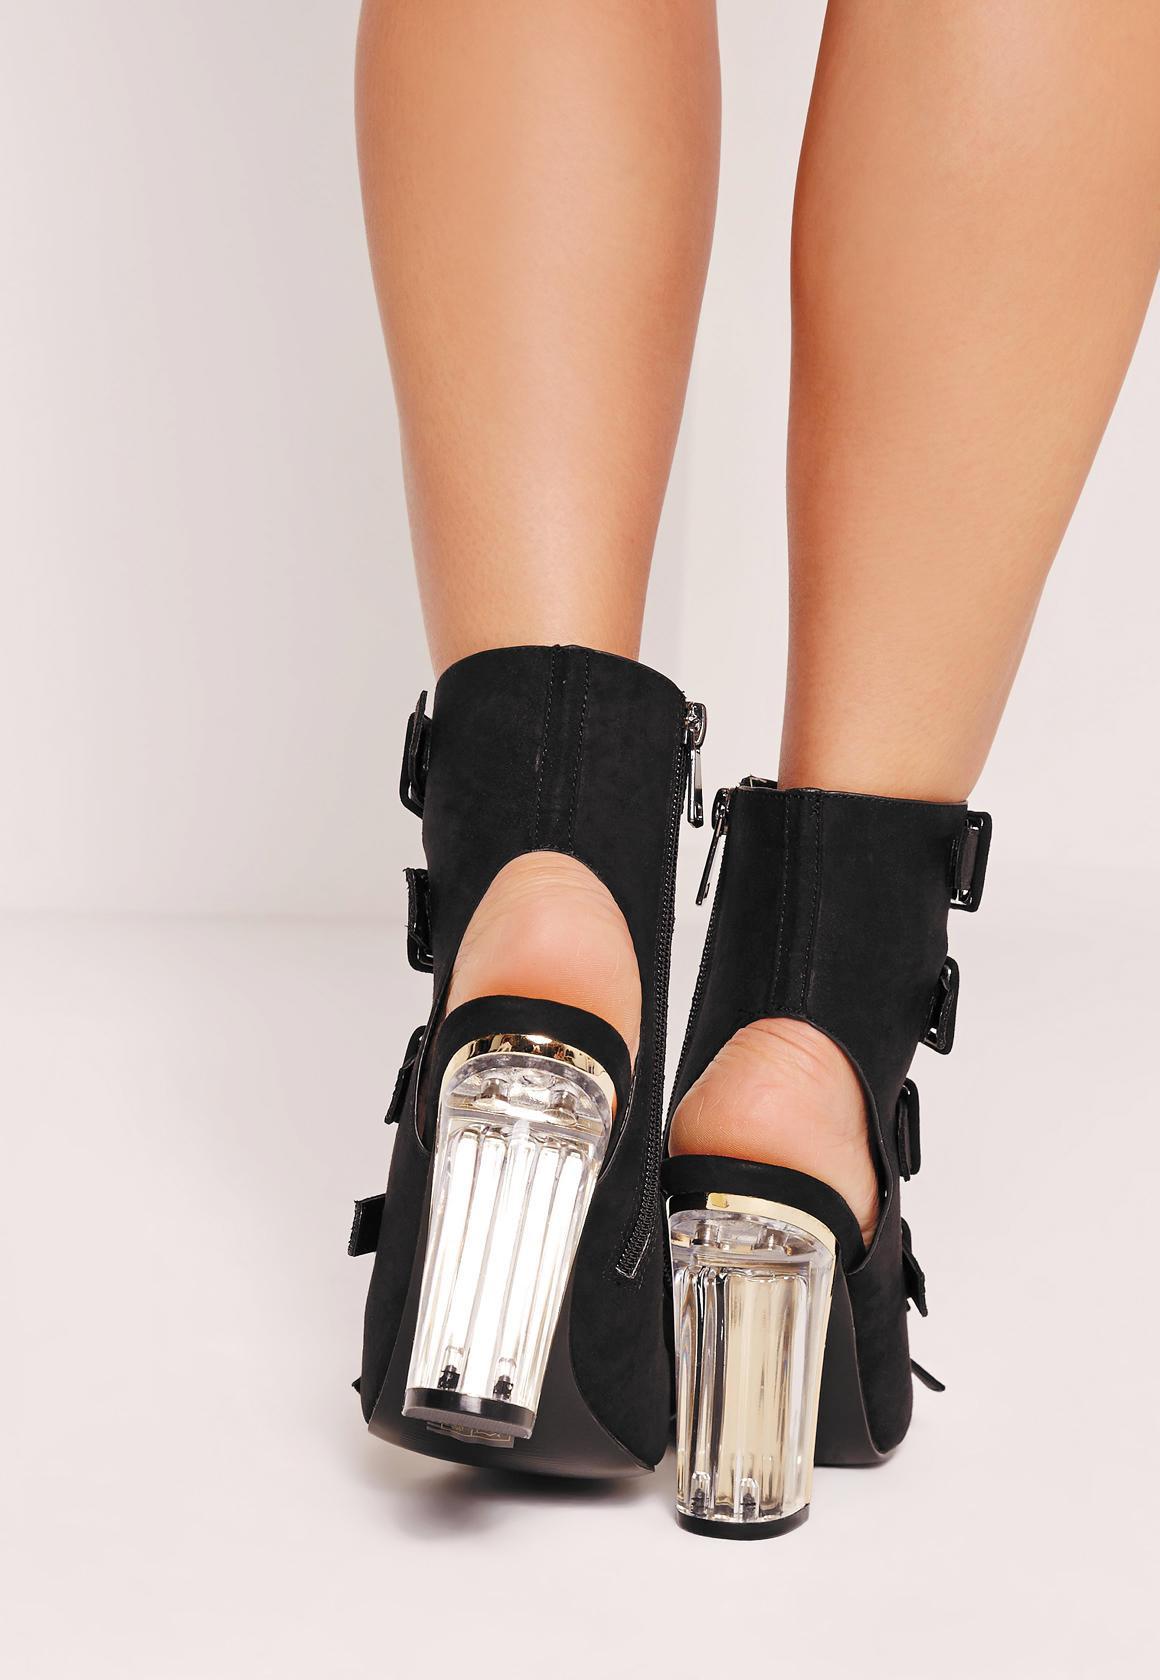 Buckle Detailed Block Heeled Sandals Black